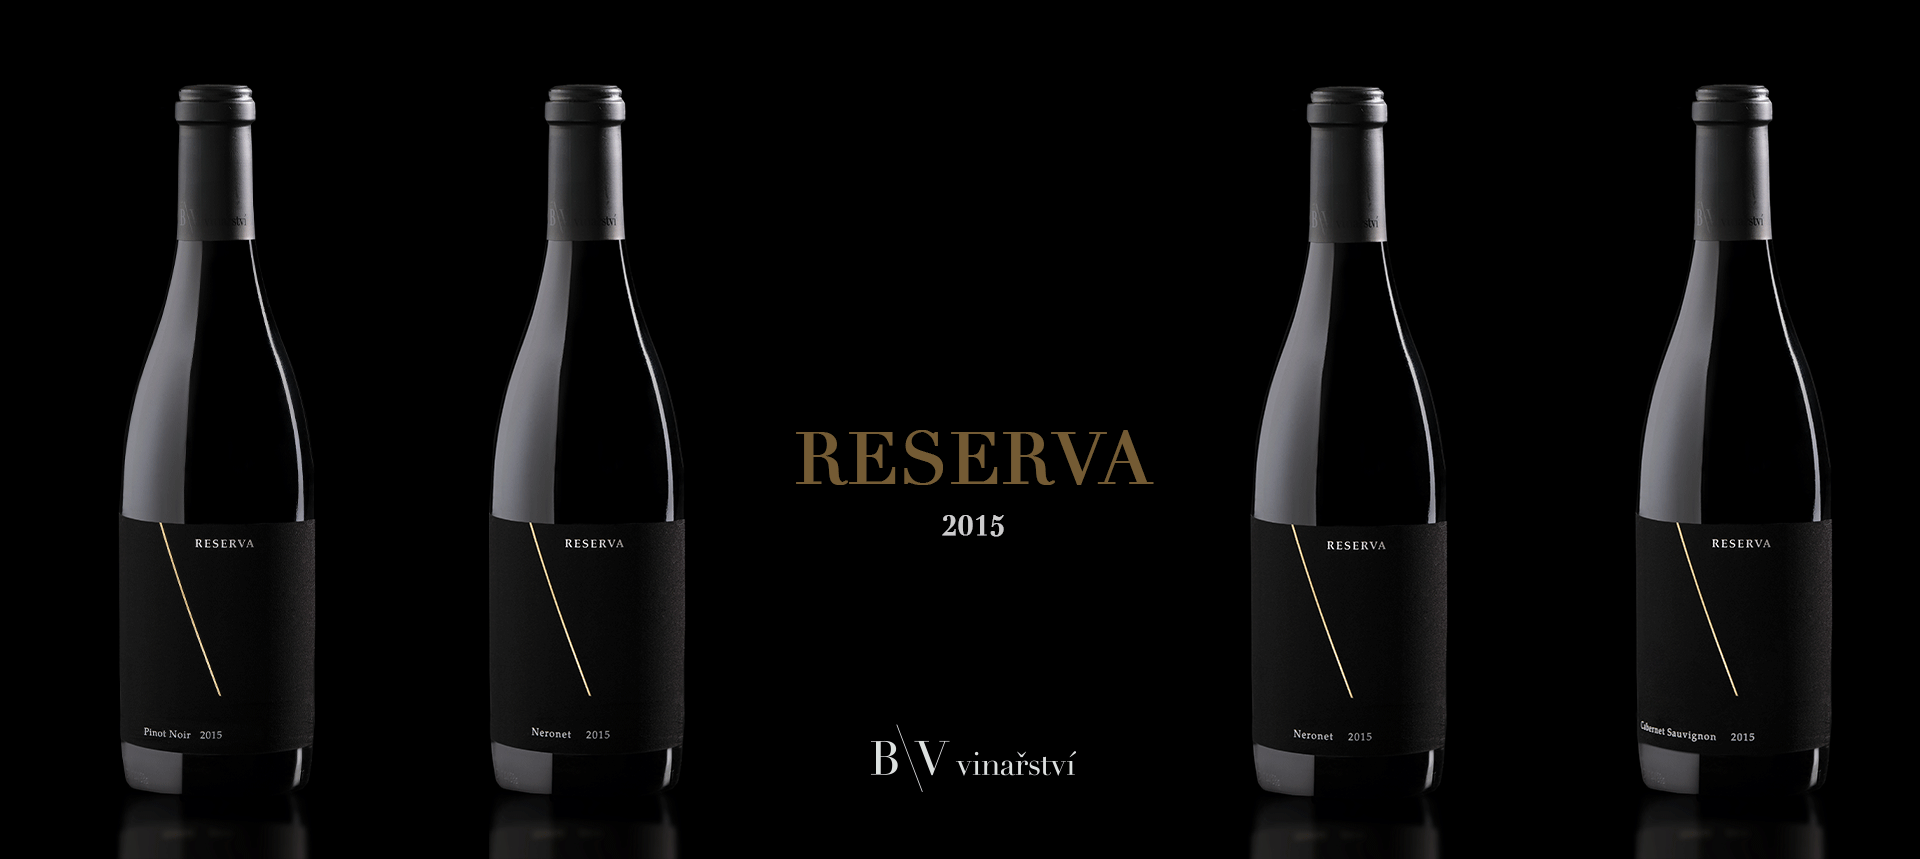 RESERVA - To nejlepší z roku 2015